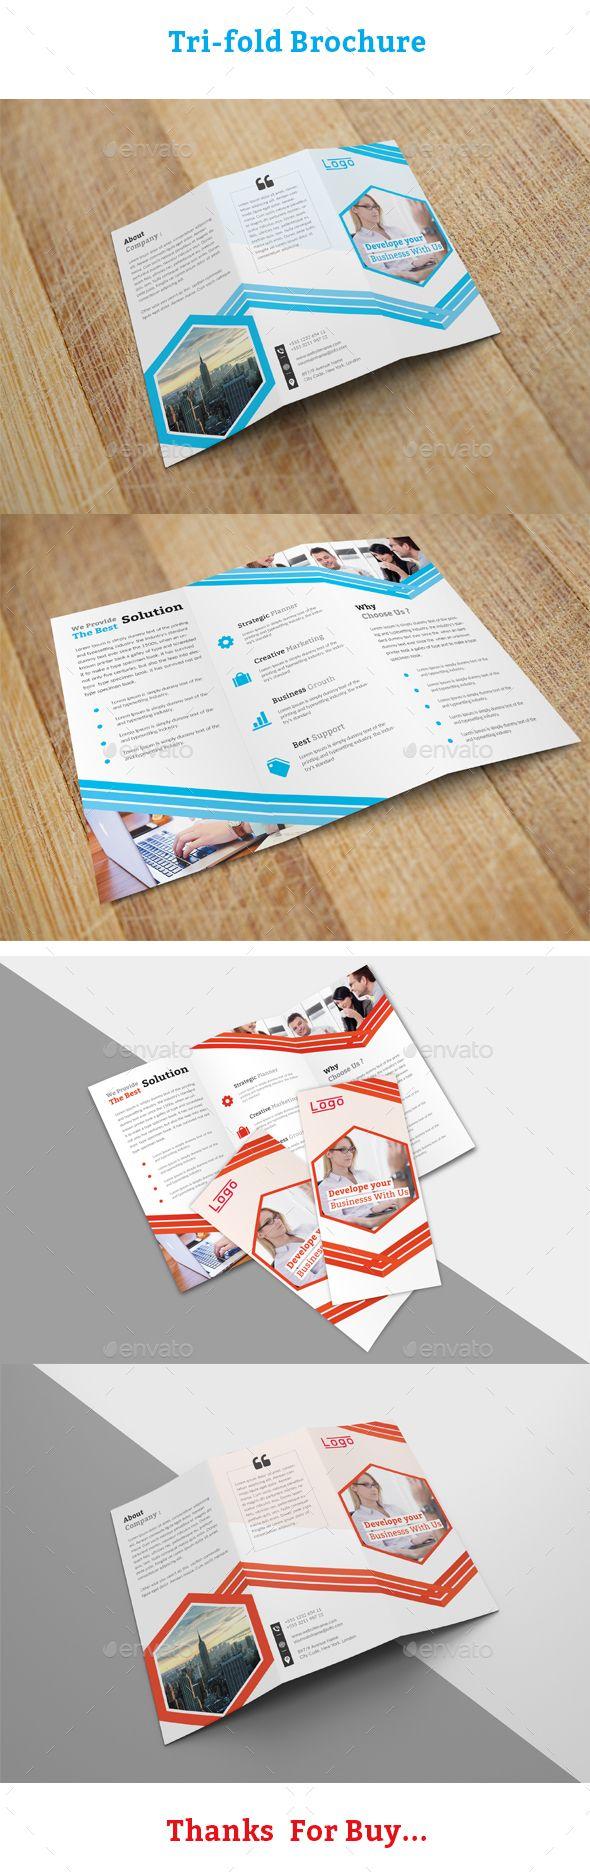 Trifold Brochure Template Tri Fold Brochure Corporate Business